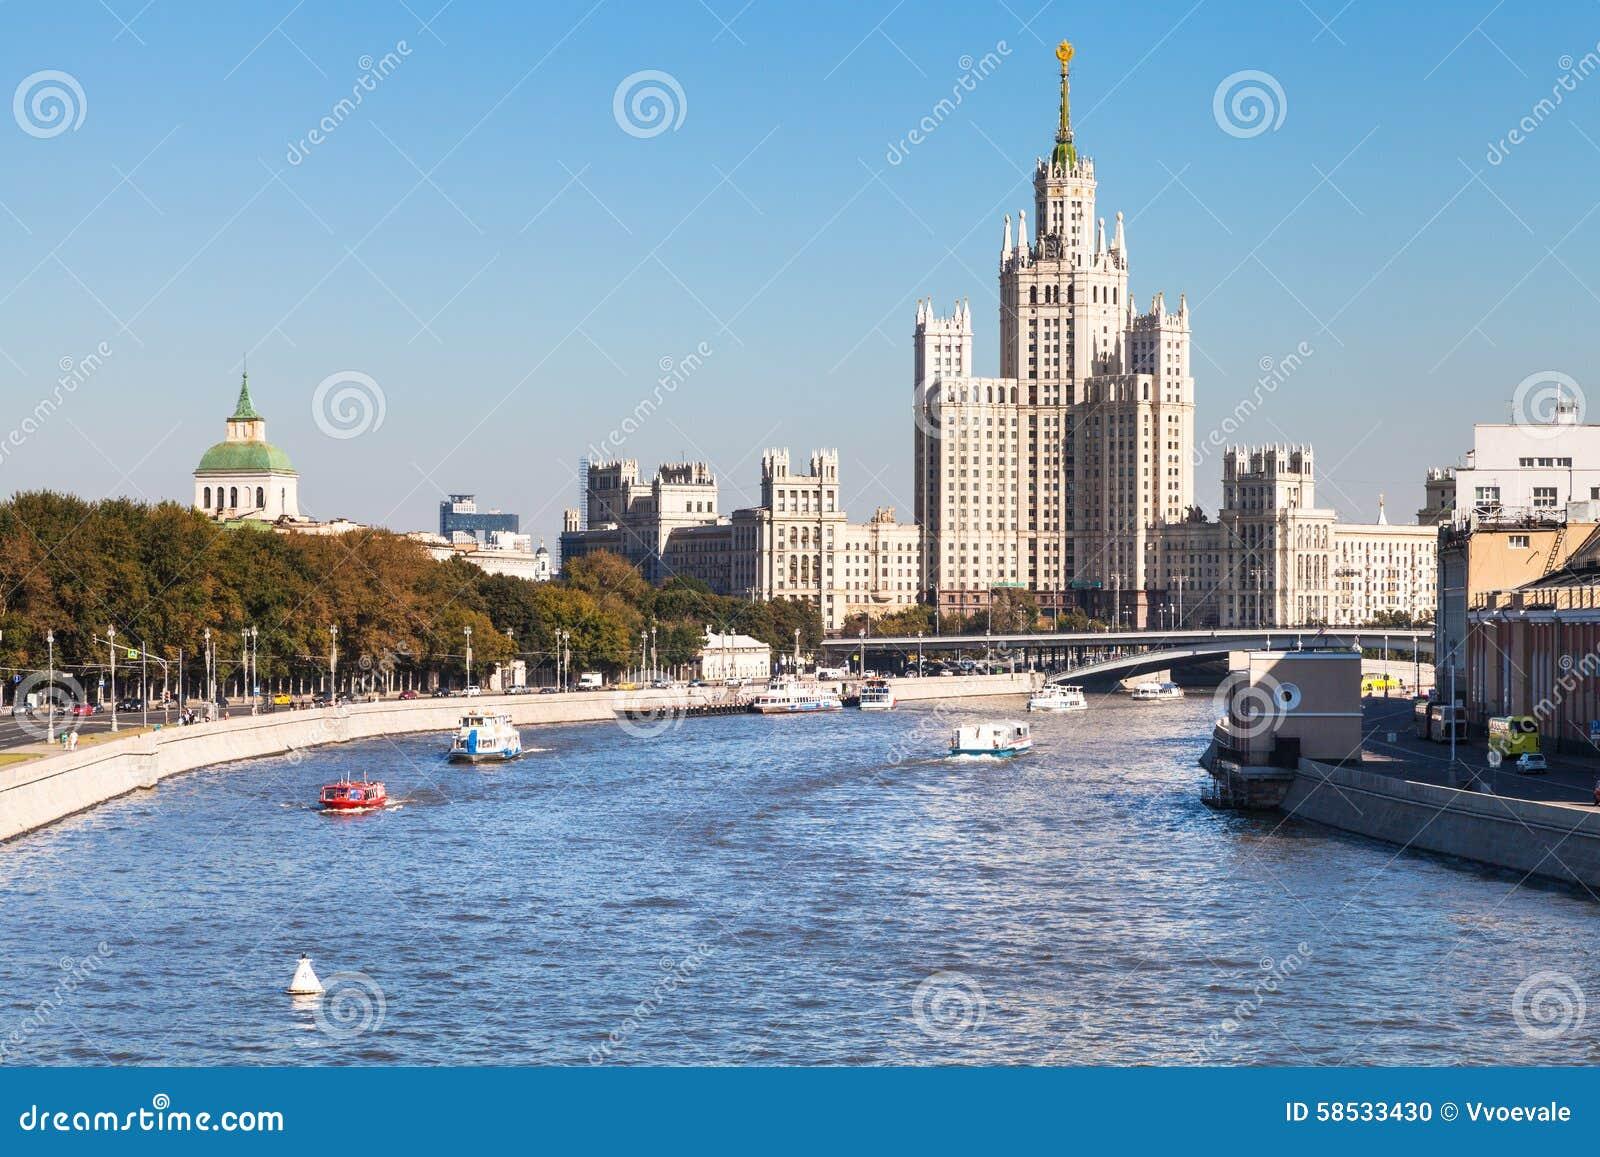 Moscow embankments 50